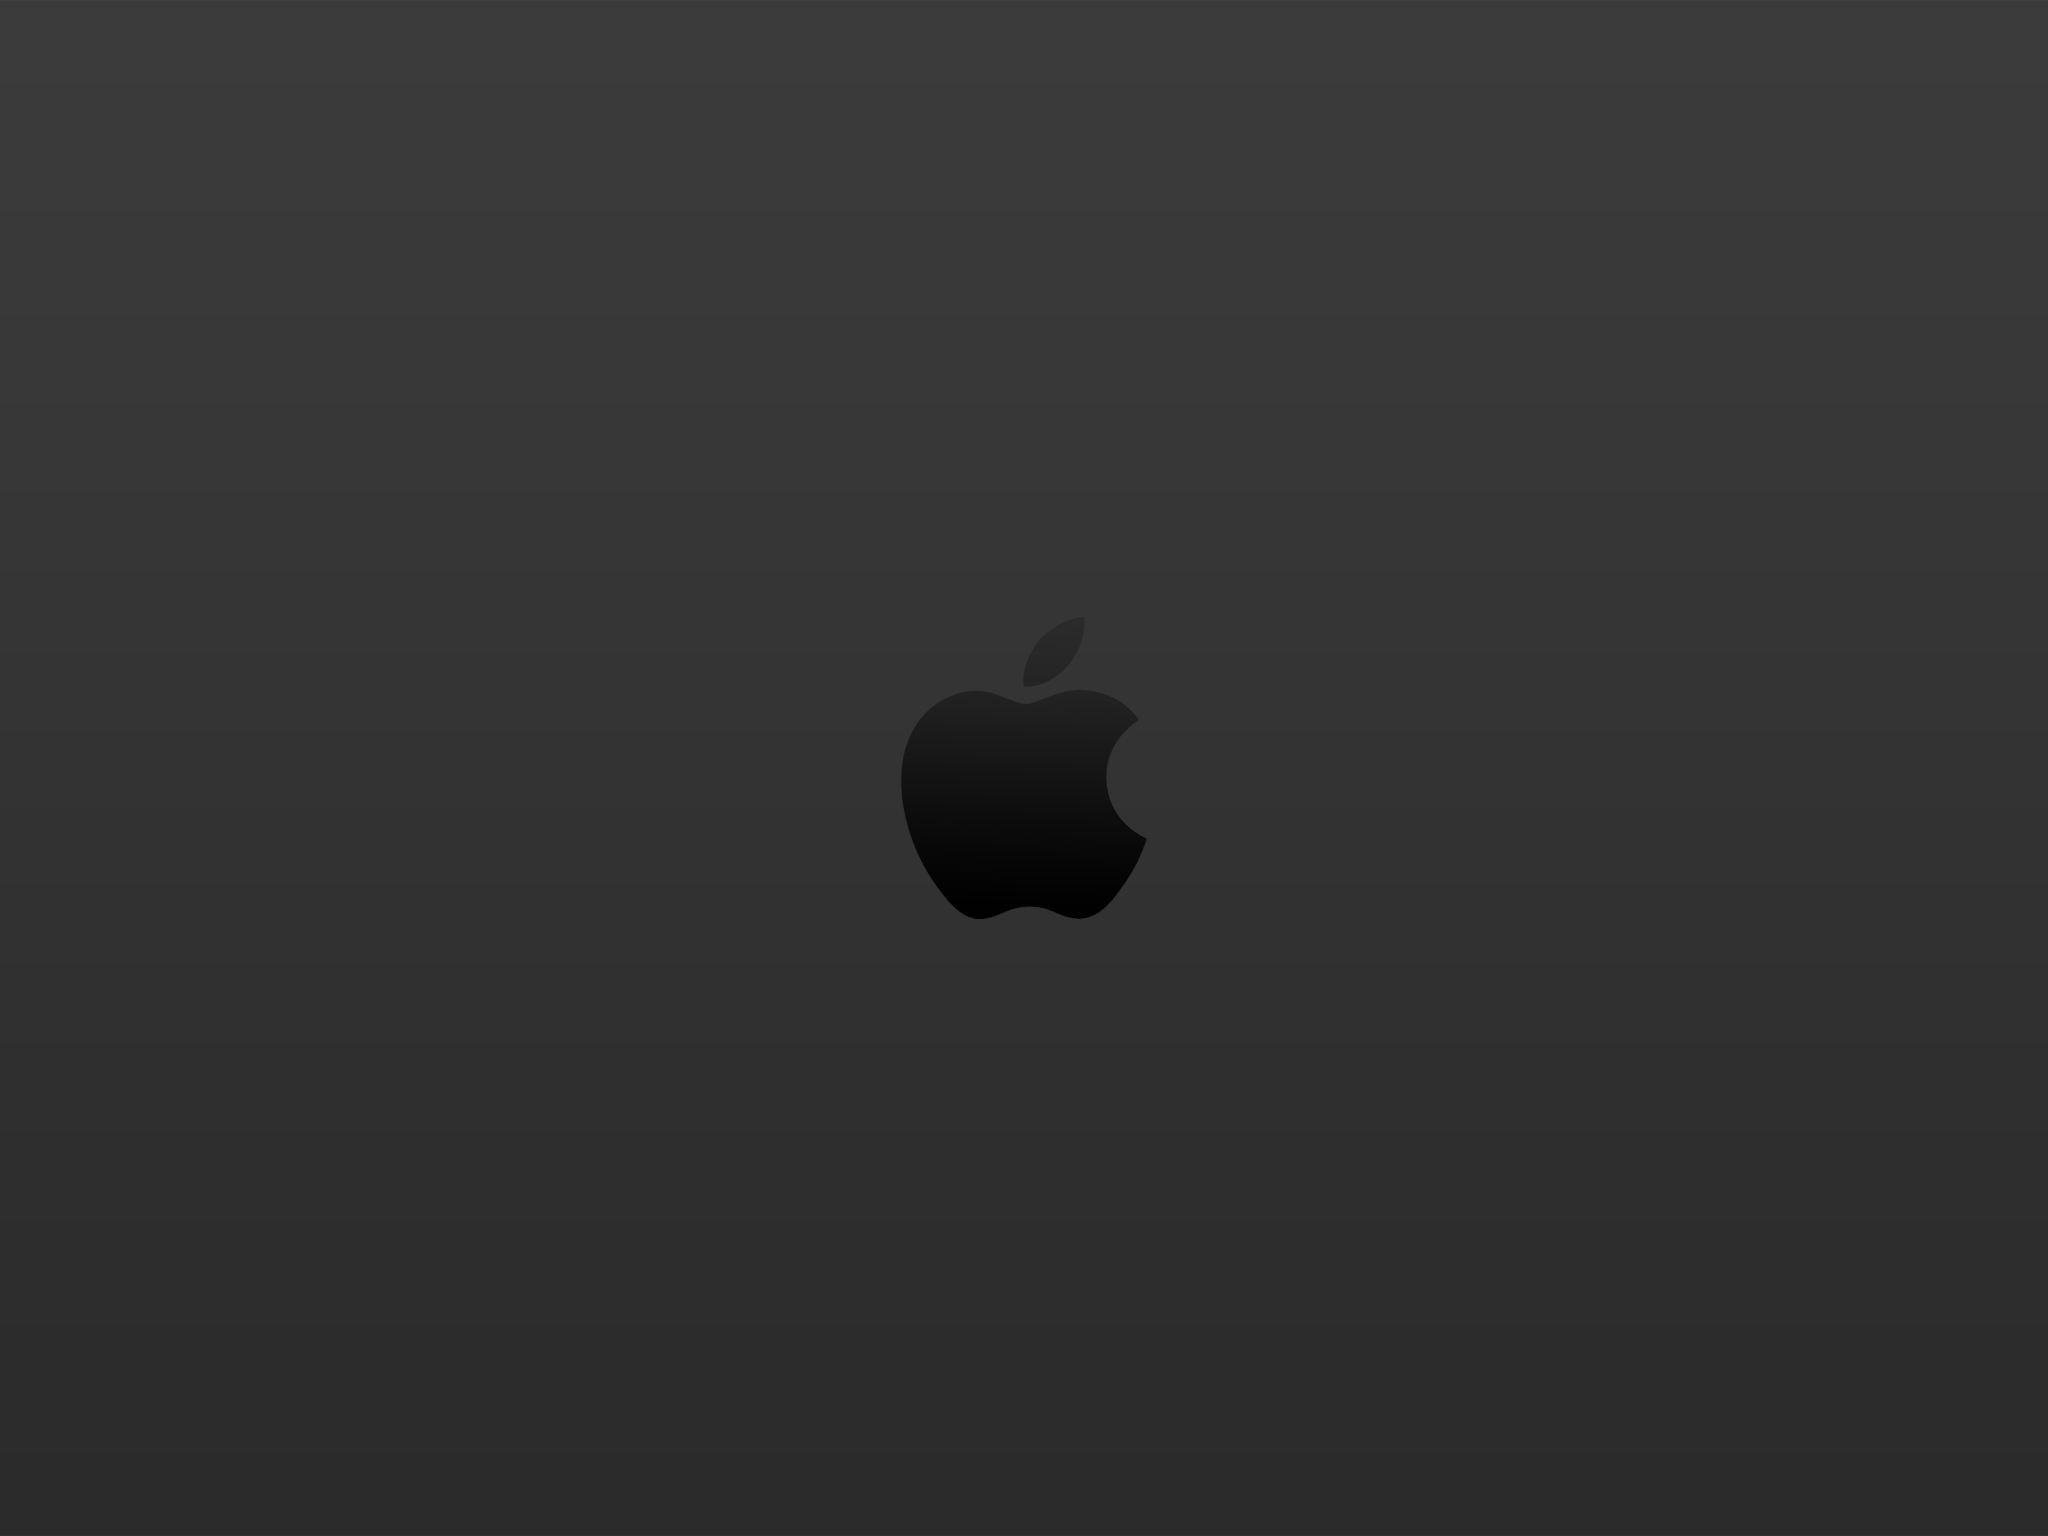 Apple Logo Black Wallpaper